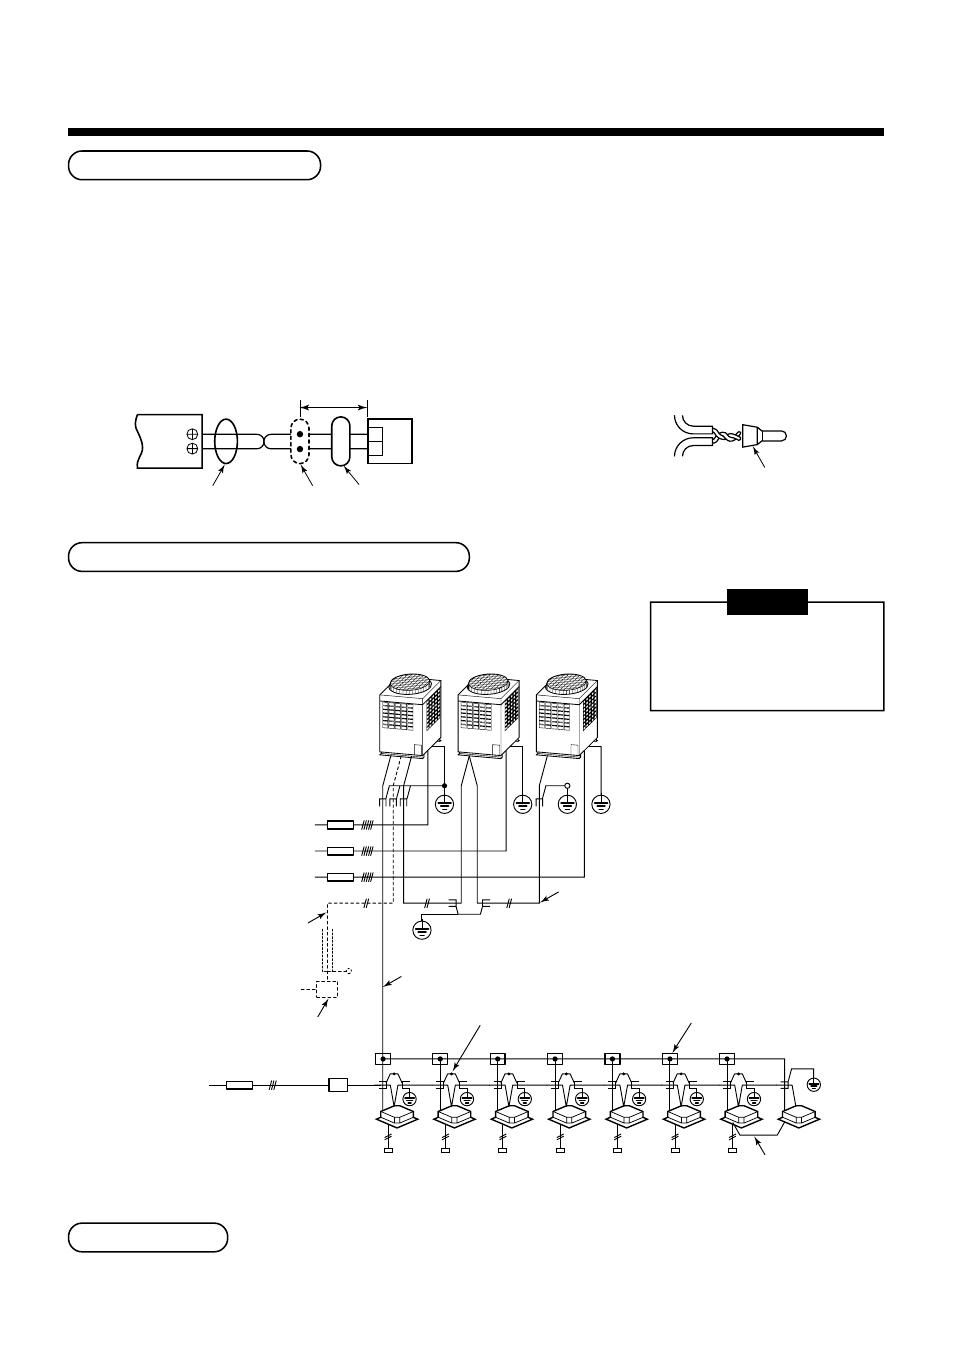 50hz 220v Wiring Diagram Library 460v To 230v Electric Work Remote Controller Address Setup Toshiba Mmk Ap0092h User Manual